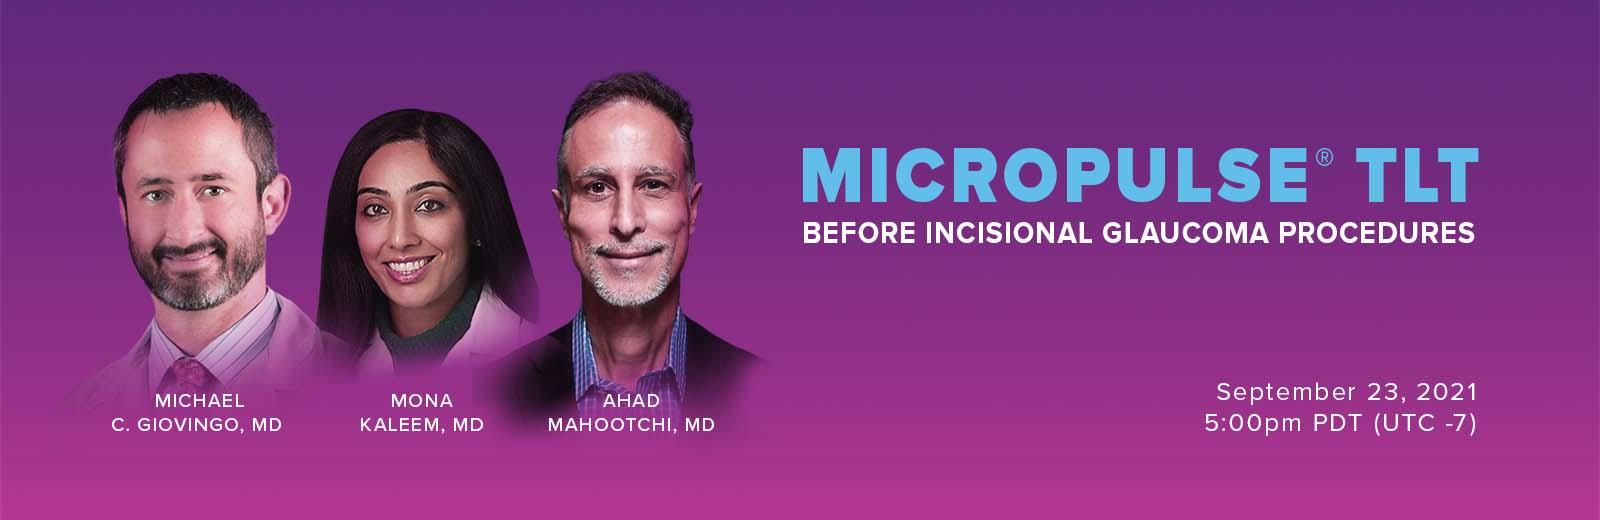 Webinar: MicroPulse TLT before incisional glaucoma procedures